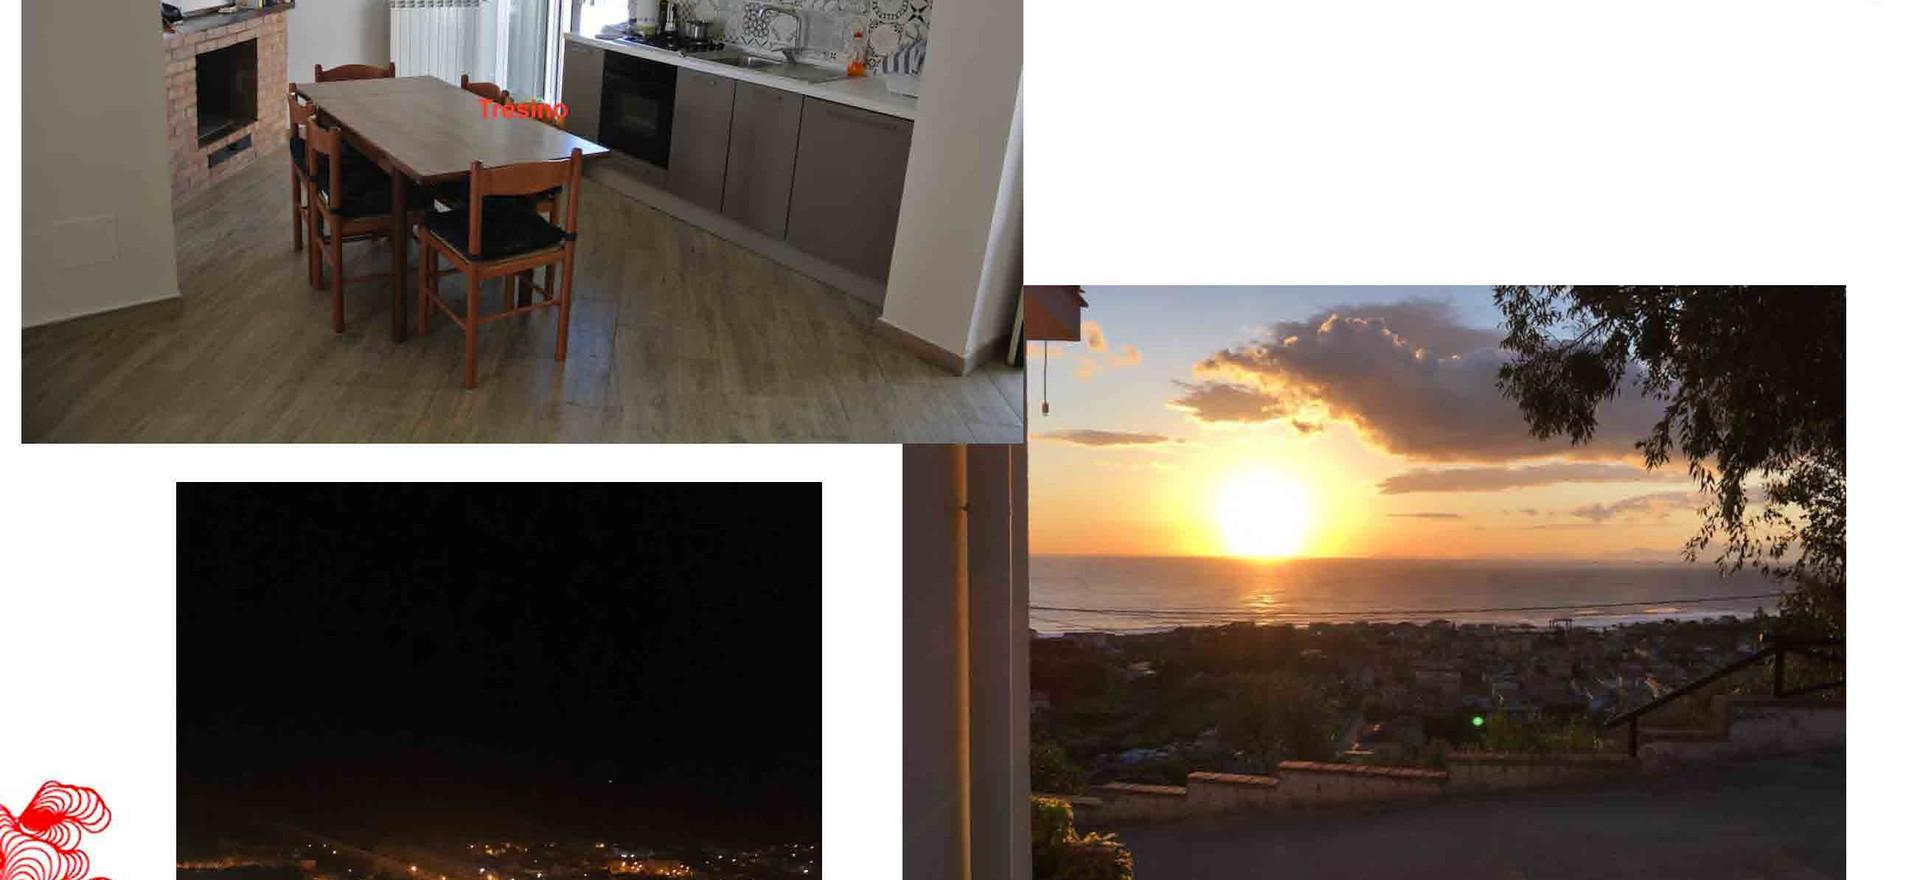 castellabate location_Pagina_4.jpg